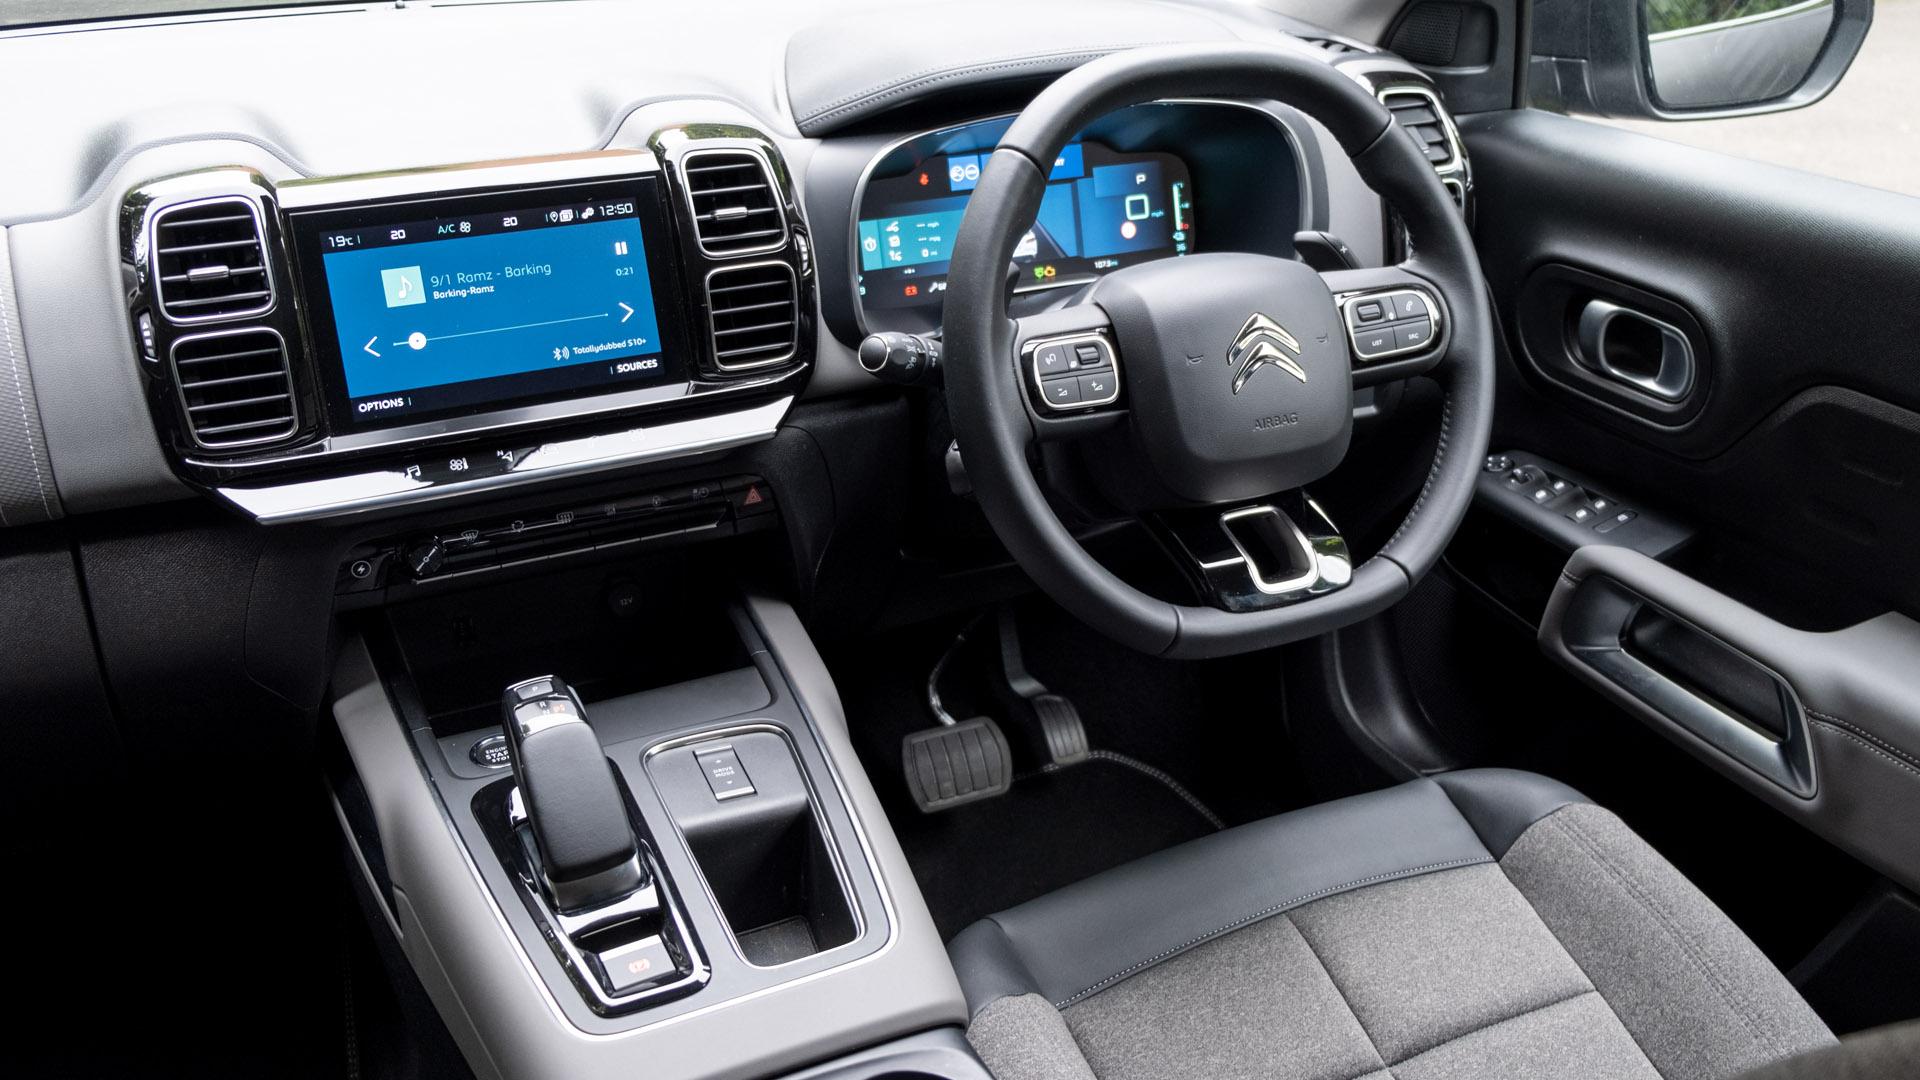 Citroen C5 Aircross Hybrid cabin